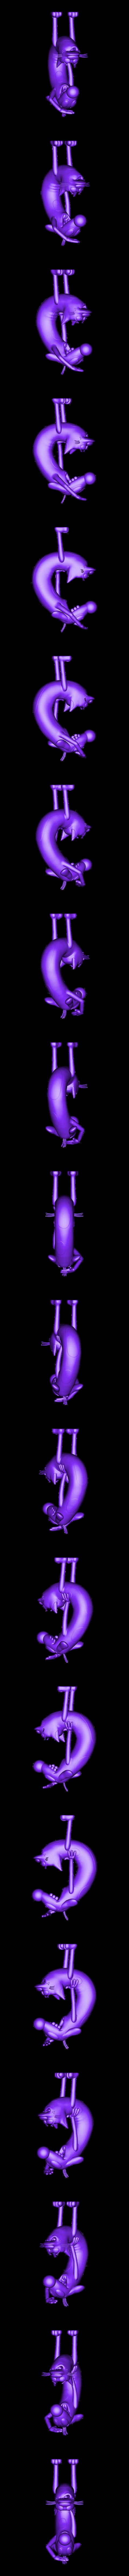 CATDOG_NICKELODEON.stl Download free STL file CatDog Nickelodeon • 3D print design, ismael_jiso